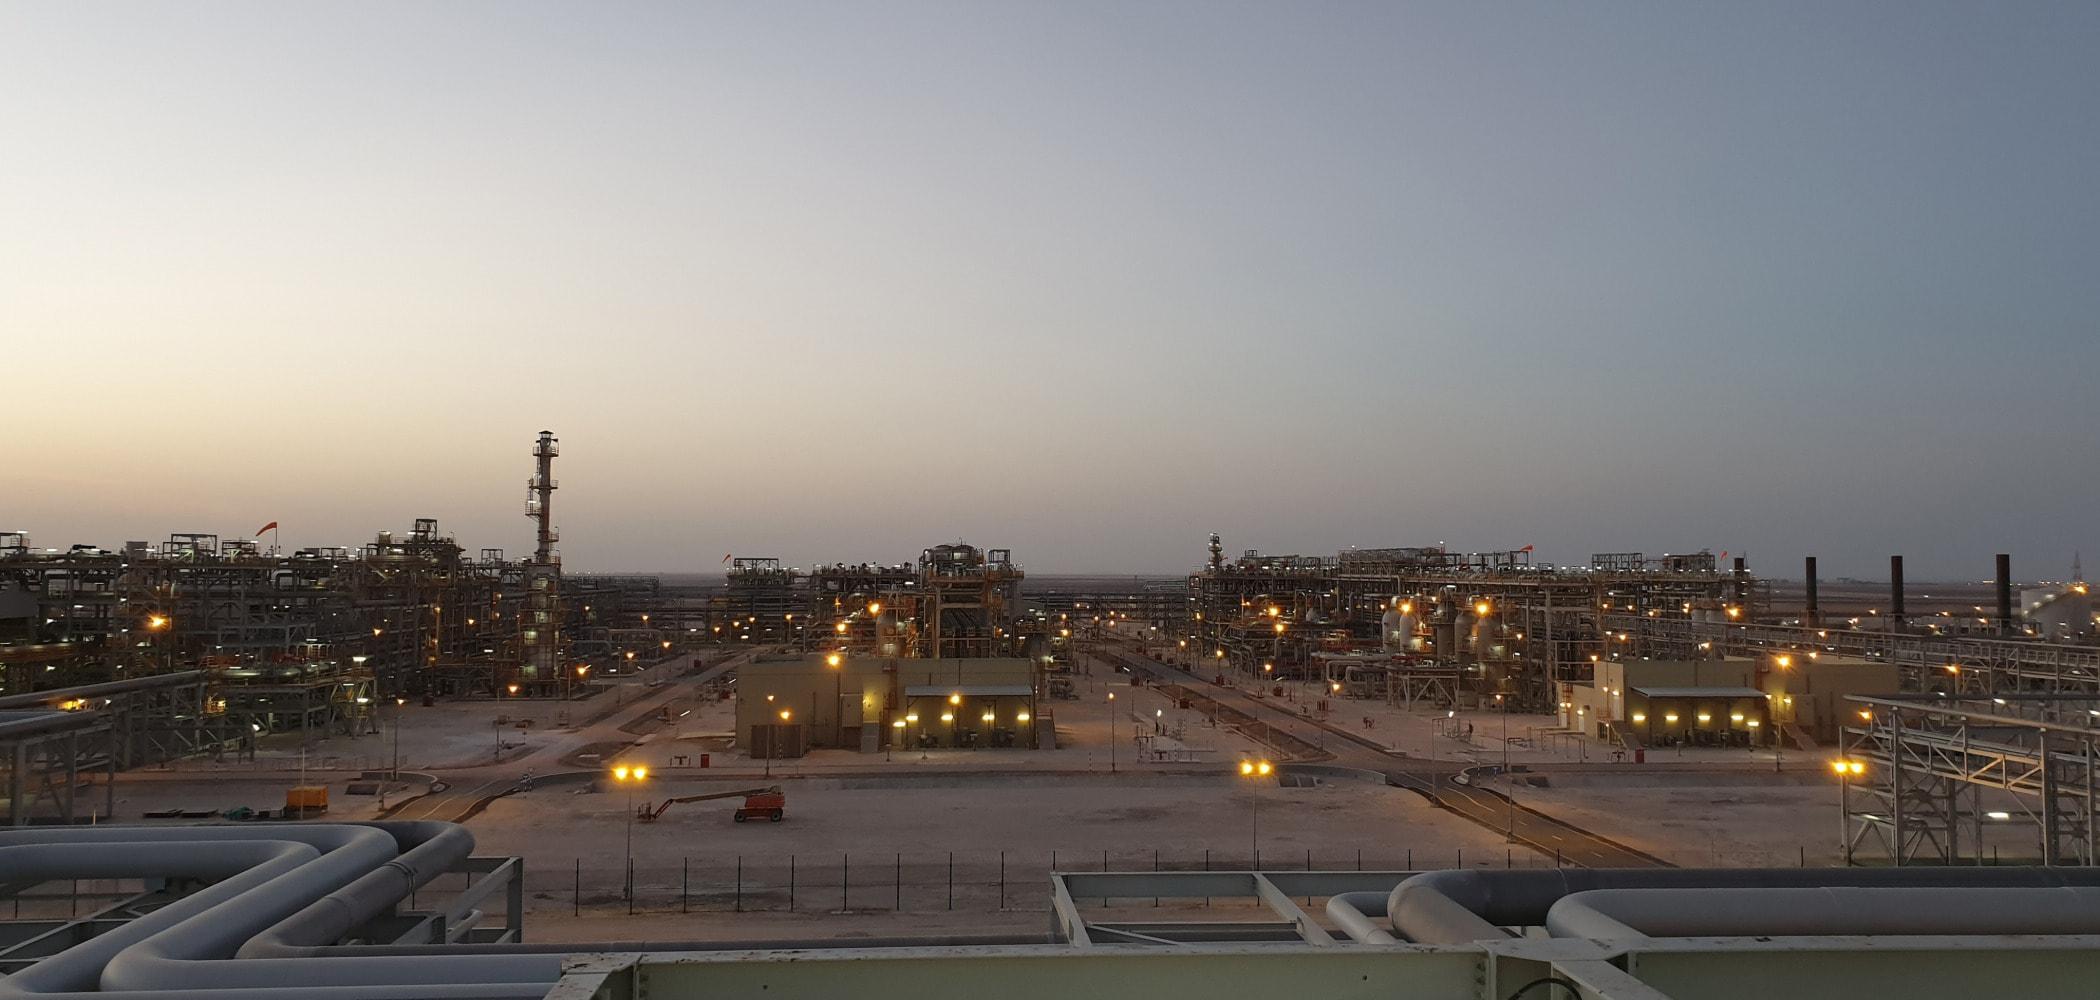 Metropolitan area, Night, Evening, Morning, City, Sky